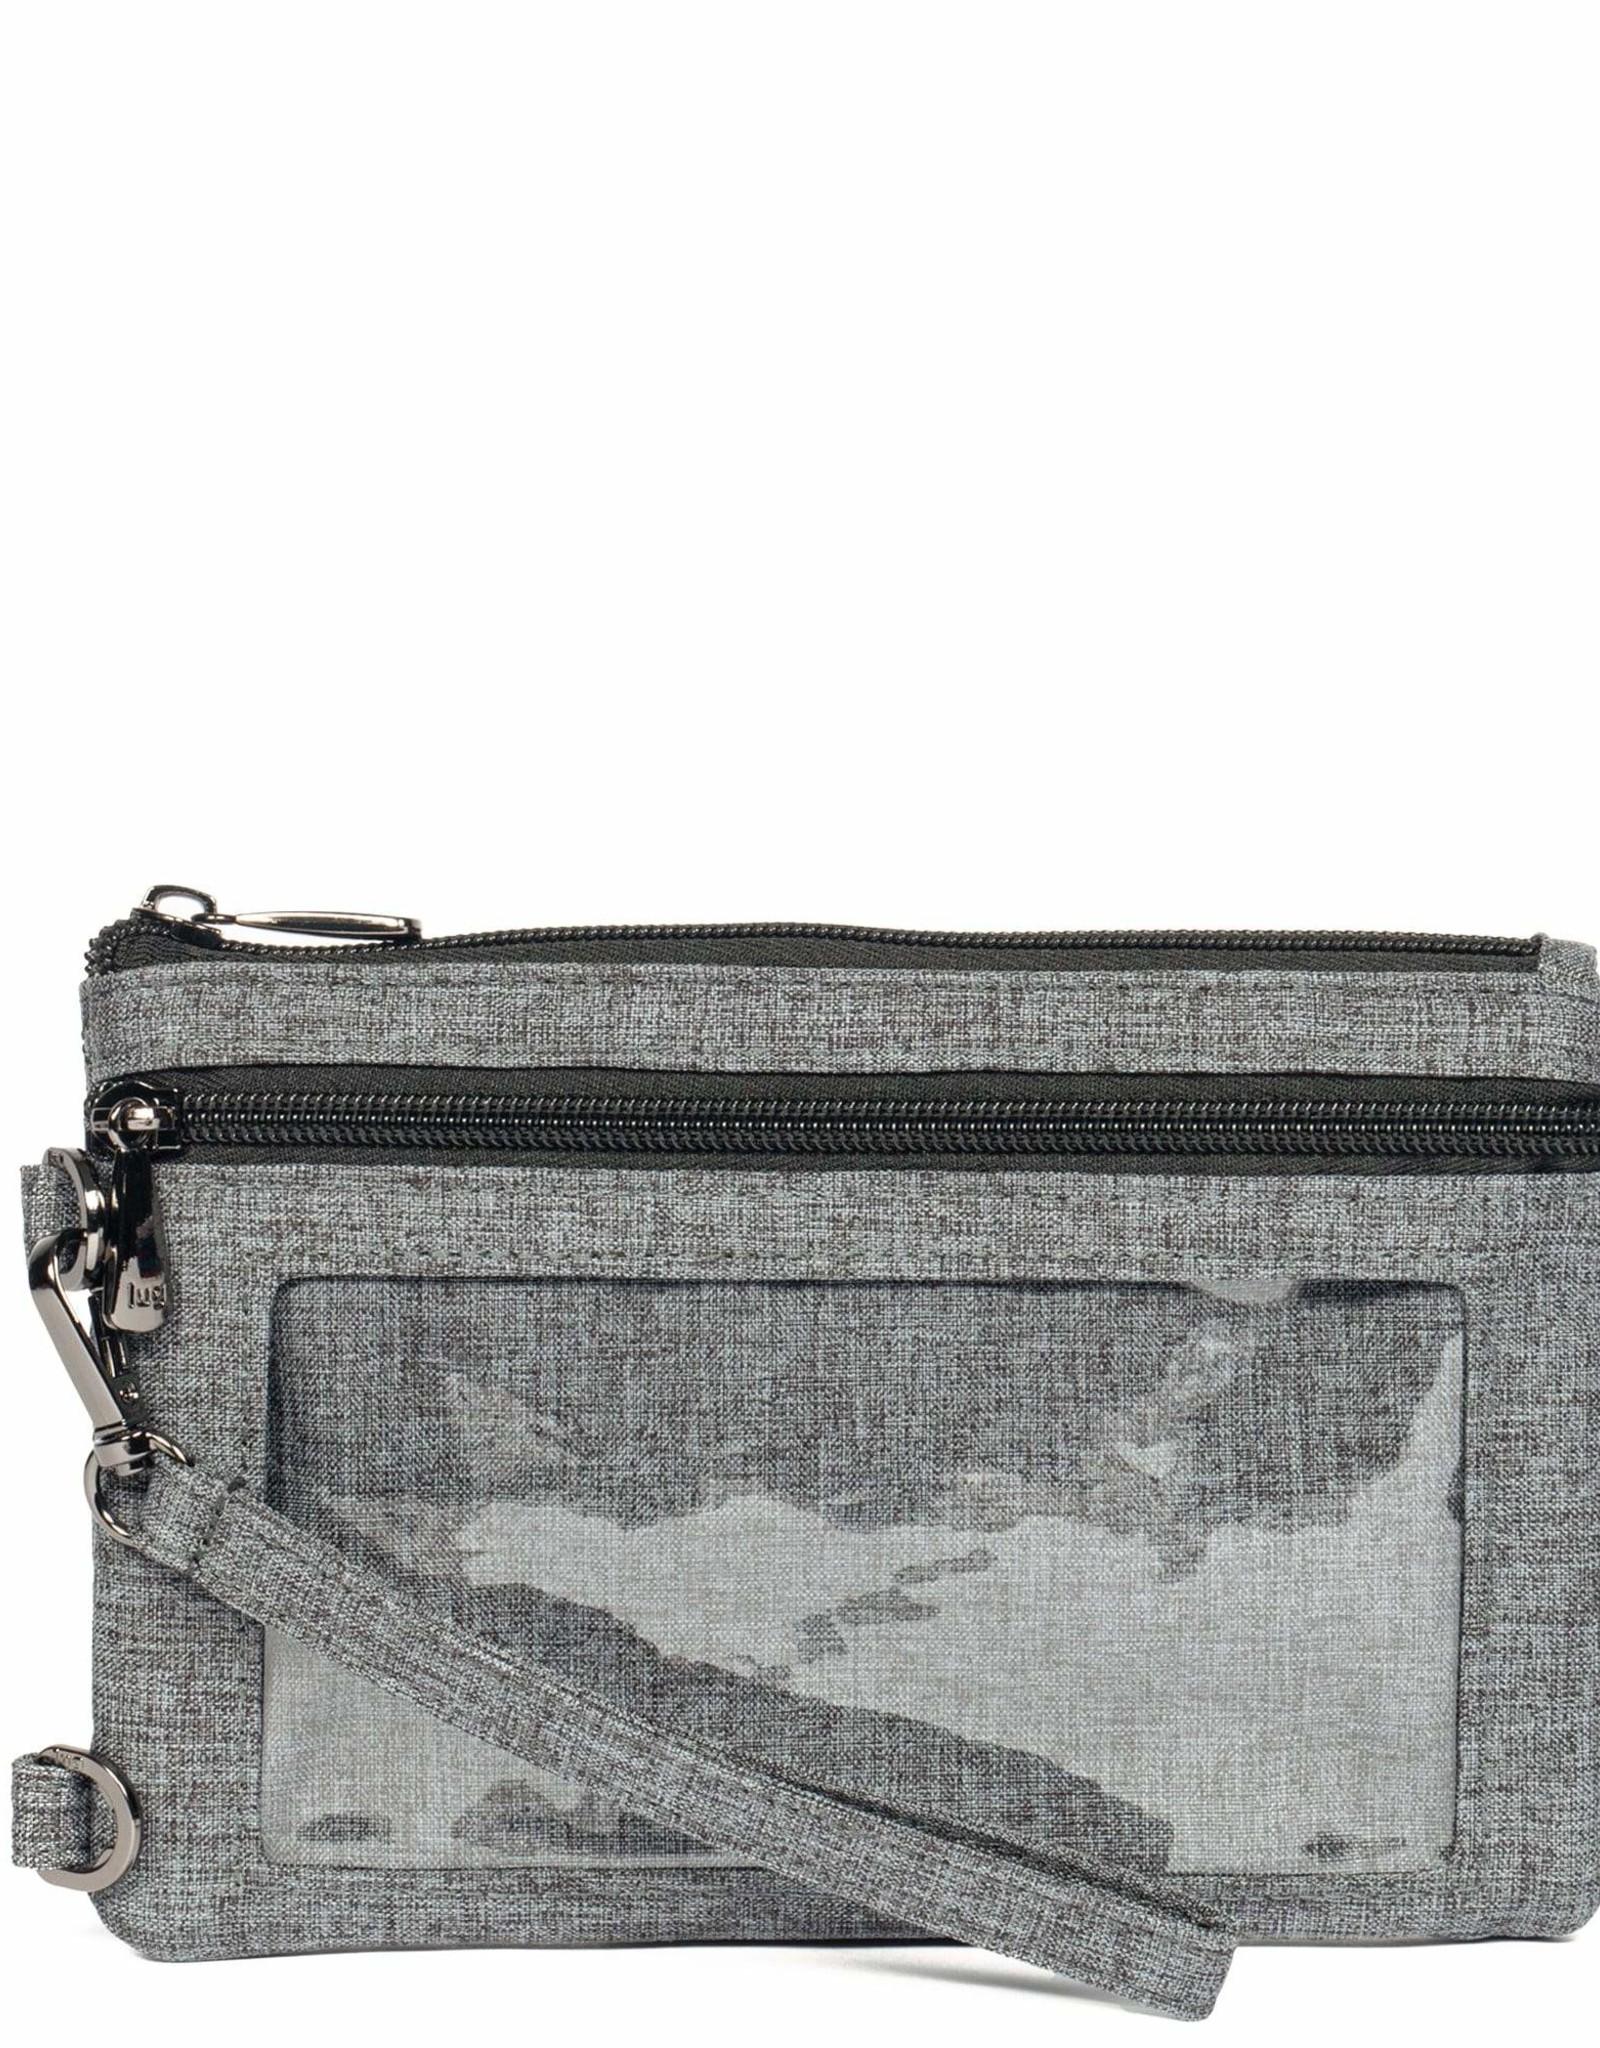 Lug Lug Peekaboo Pouch with RFID